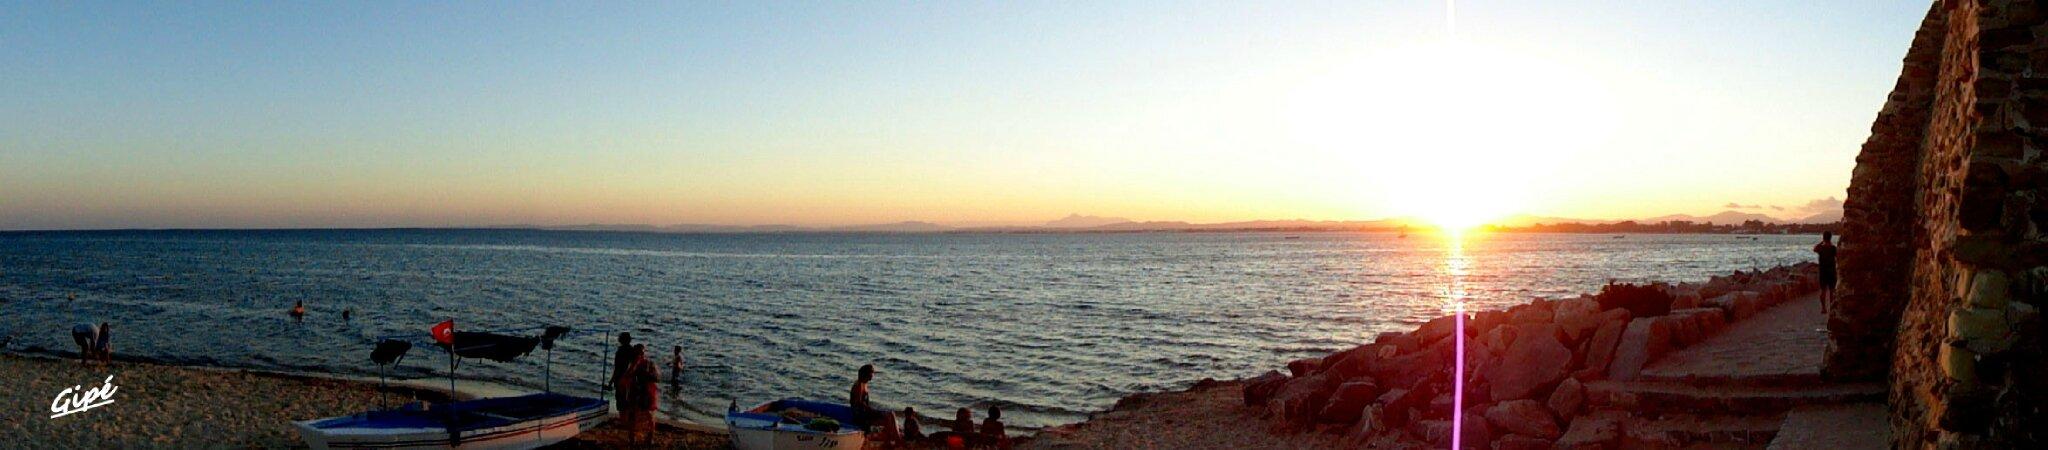 Coucher de soleil du jeudi 1er août 2013